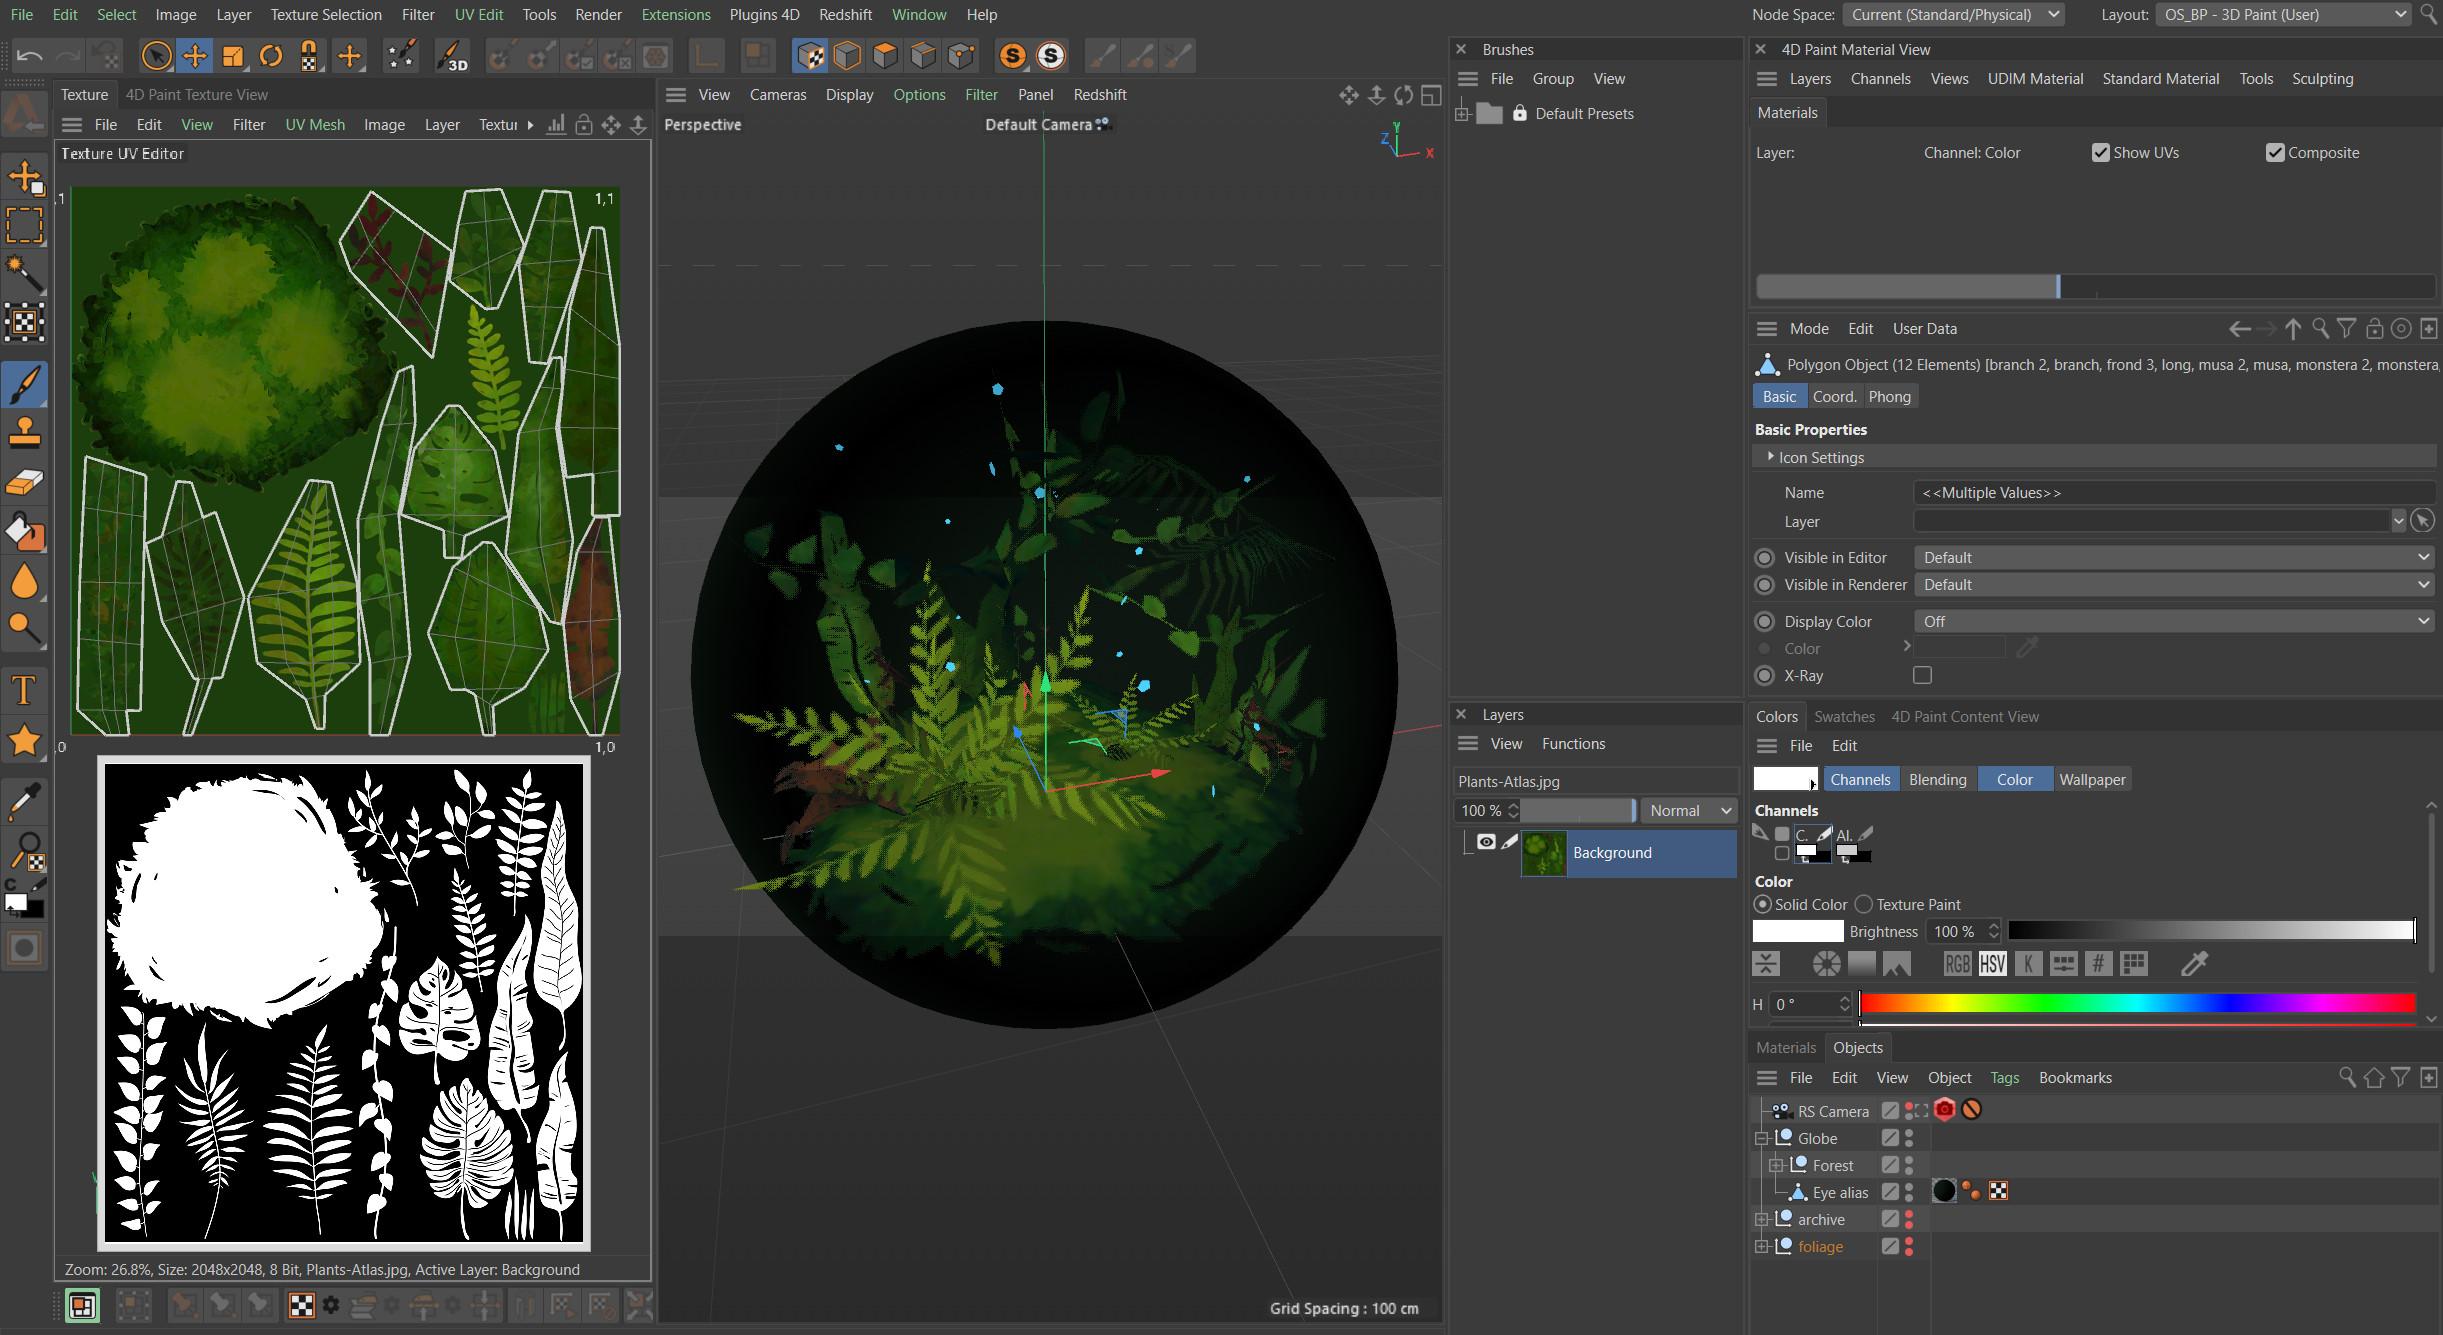 Blog post: Process / mini-tutorial: Making an eye-forest in Cinema 4D https://www.artstation.com/natureintheory/blog/L3ZR